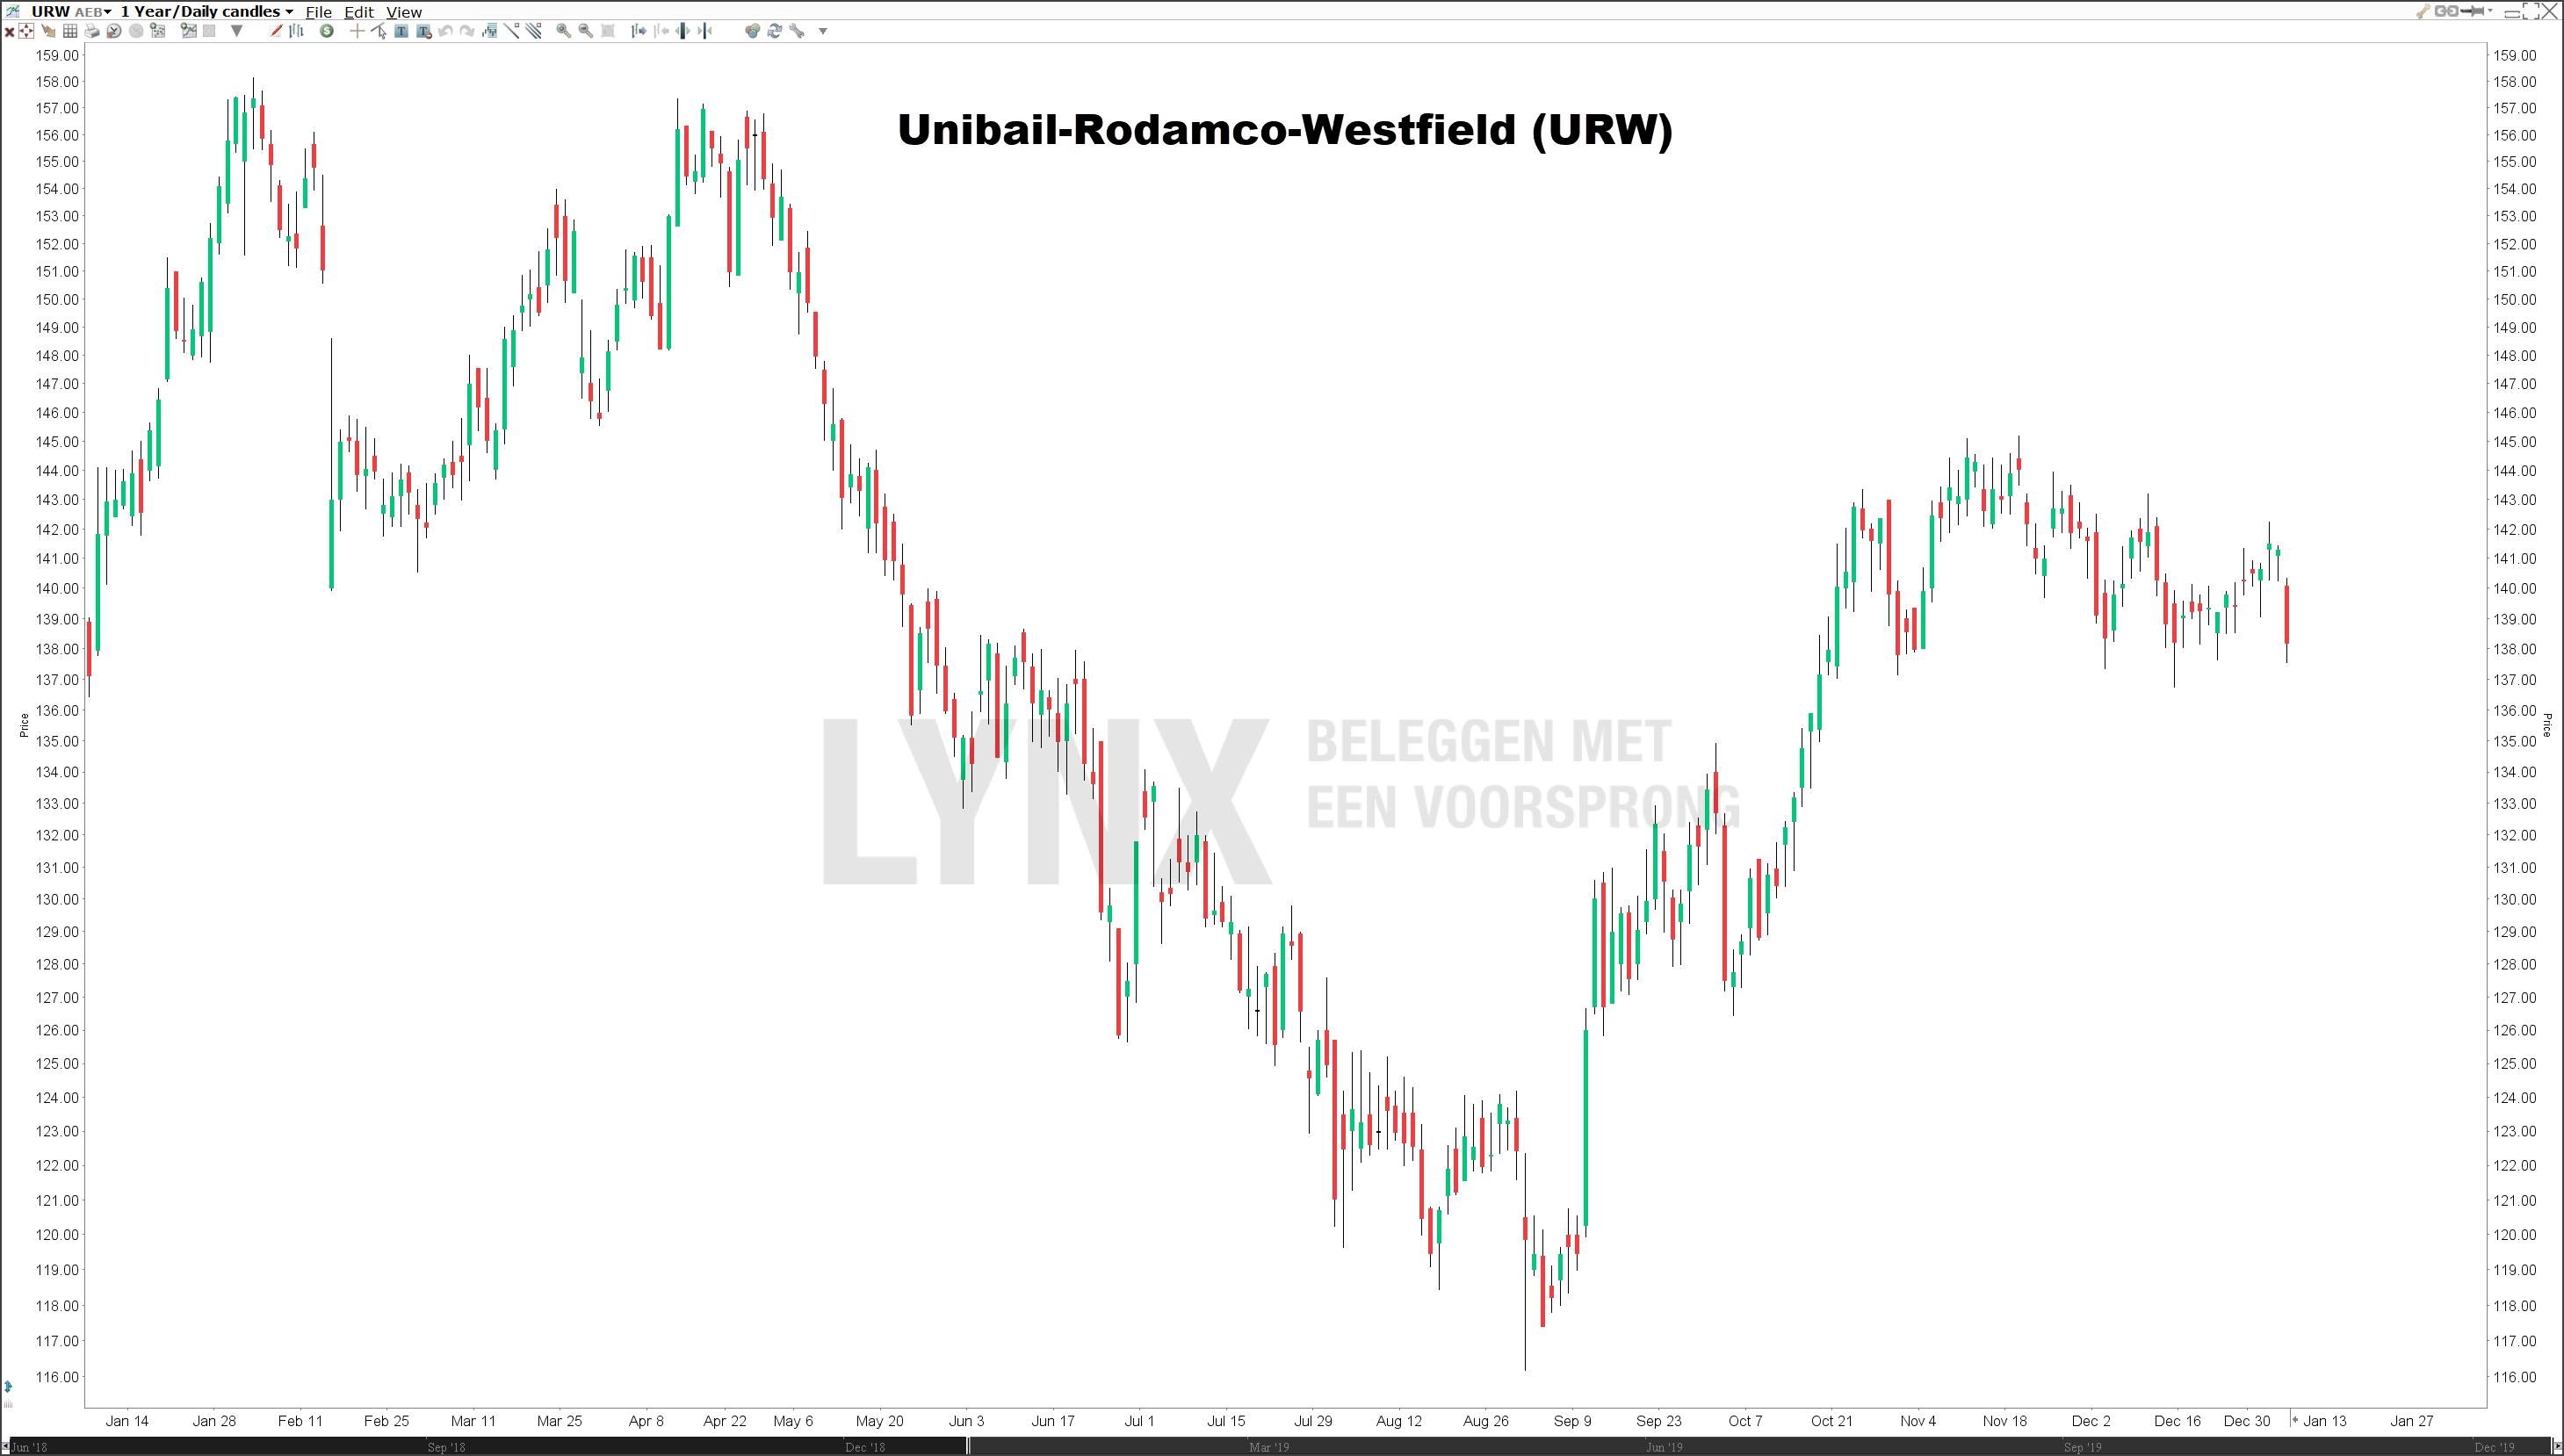 Koers Unibail-Rodamco-Westfield Nederlandse dividendaandelen